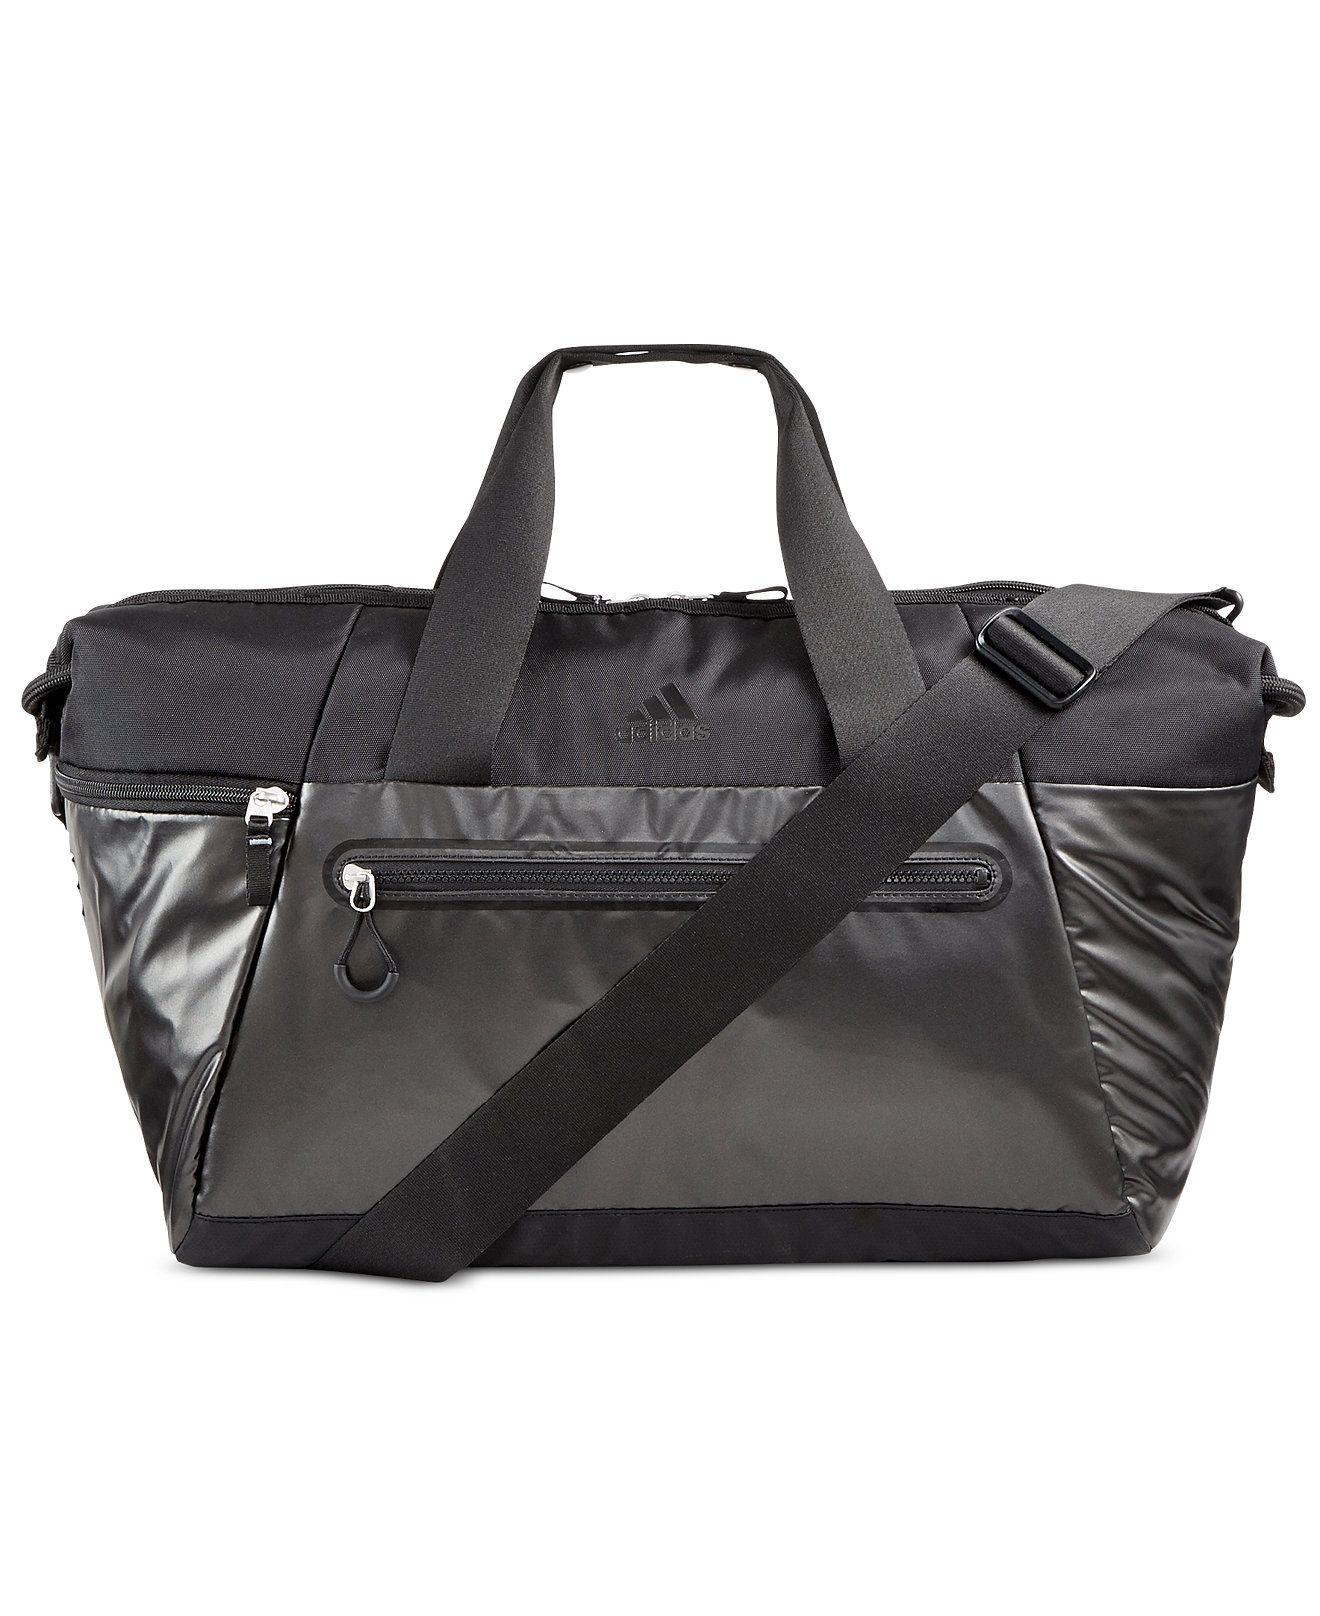 adidas Studio Duffel Bag - Women - Macy s  1635762ab6a